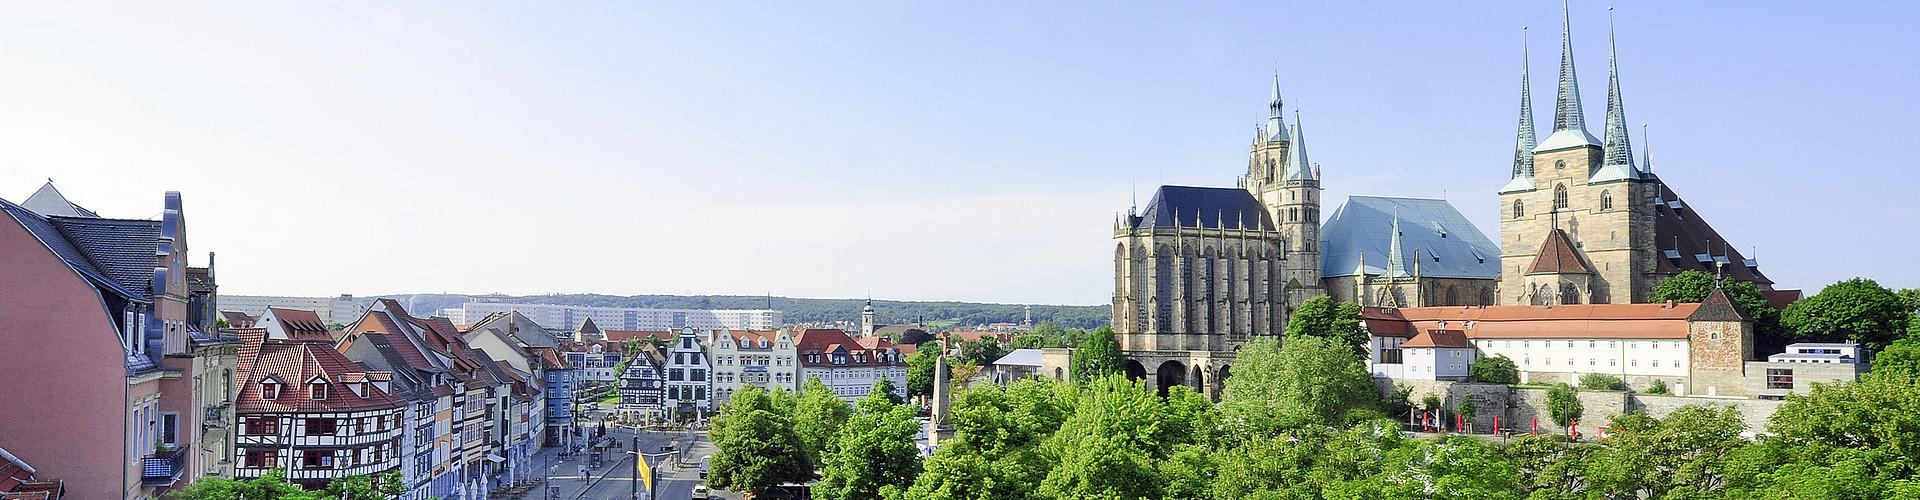 Erfurt Panorama (B. Neumann)